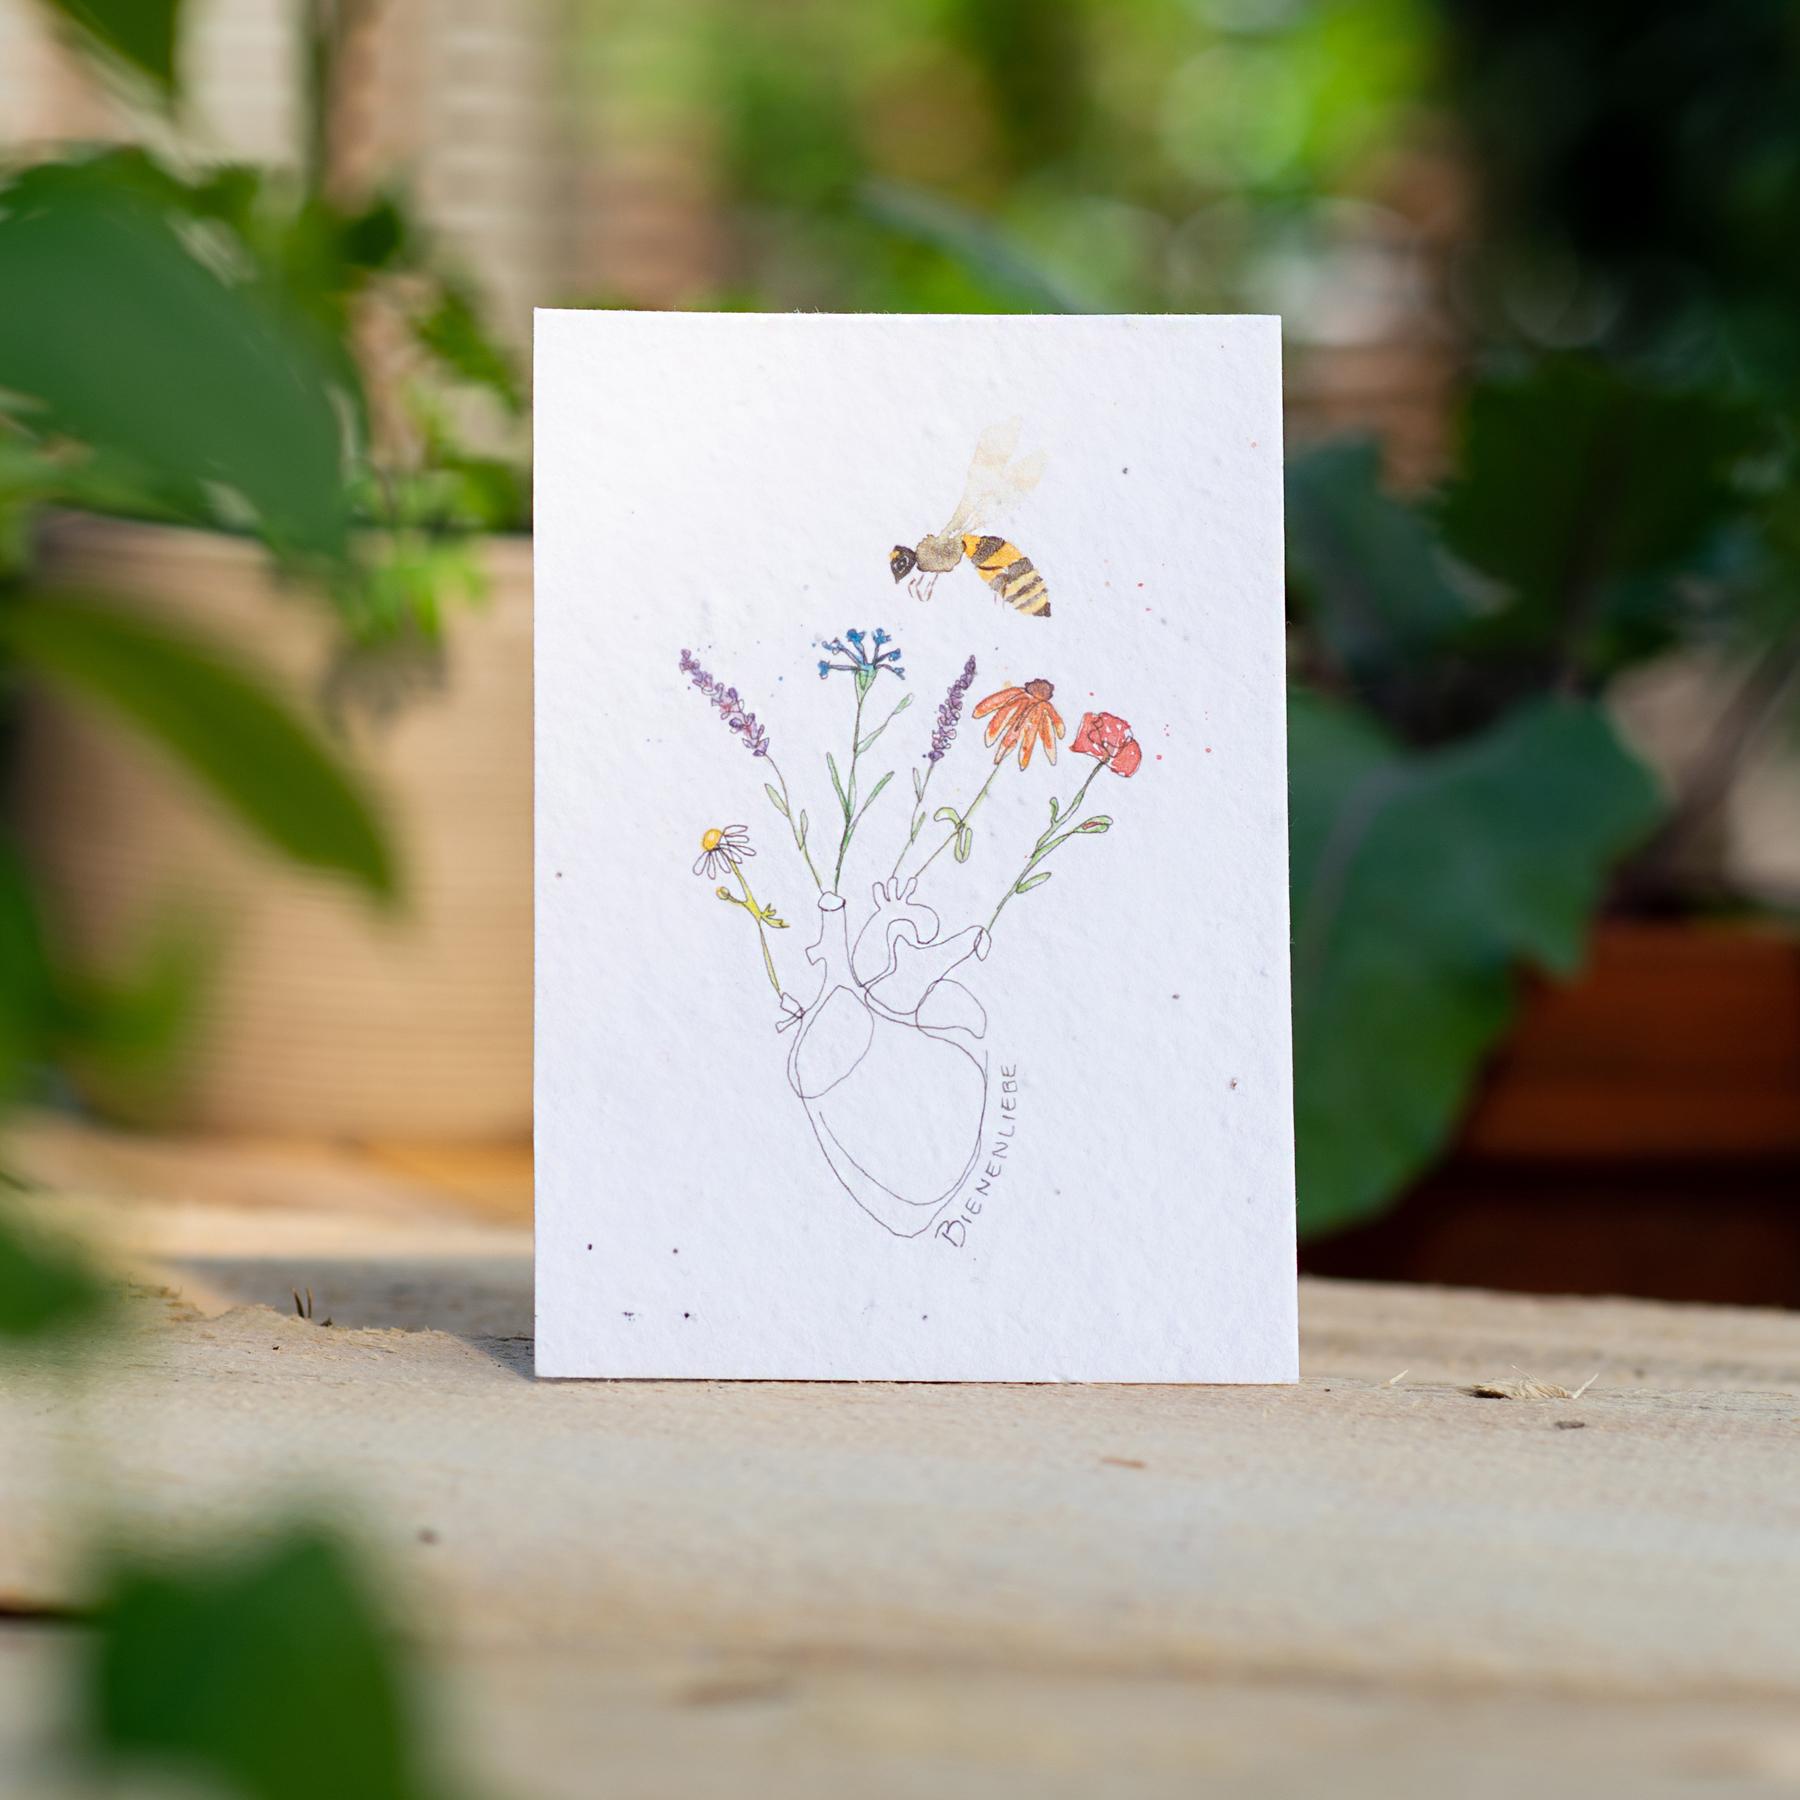 "Gewinnerkarte Wachsende Kunst 2021 ""Bienenliebe"" Biene Blume Herz"